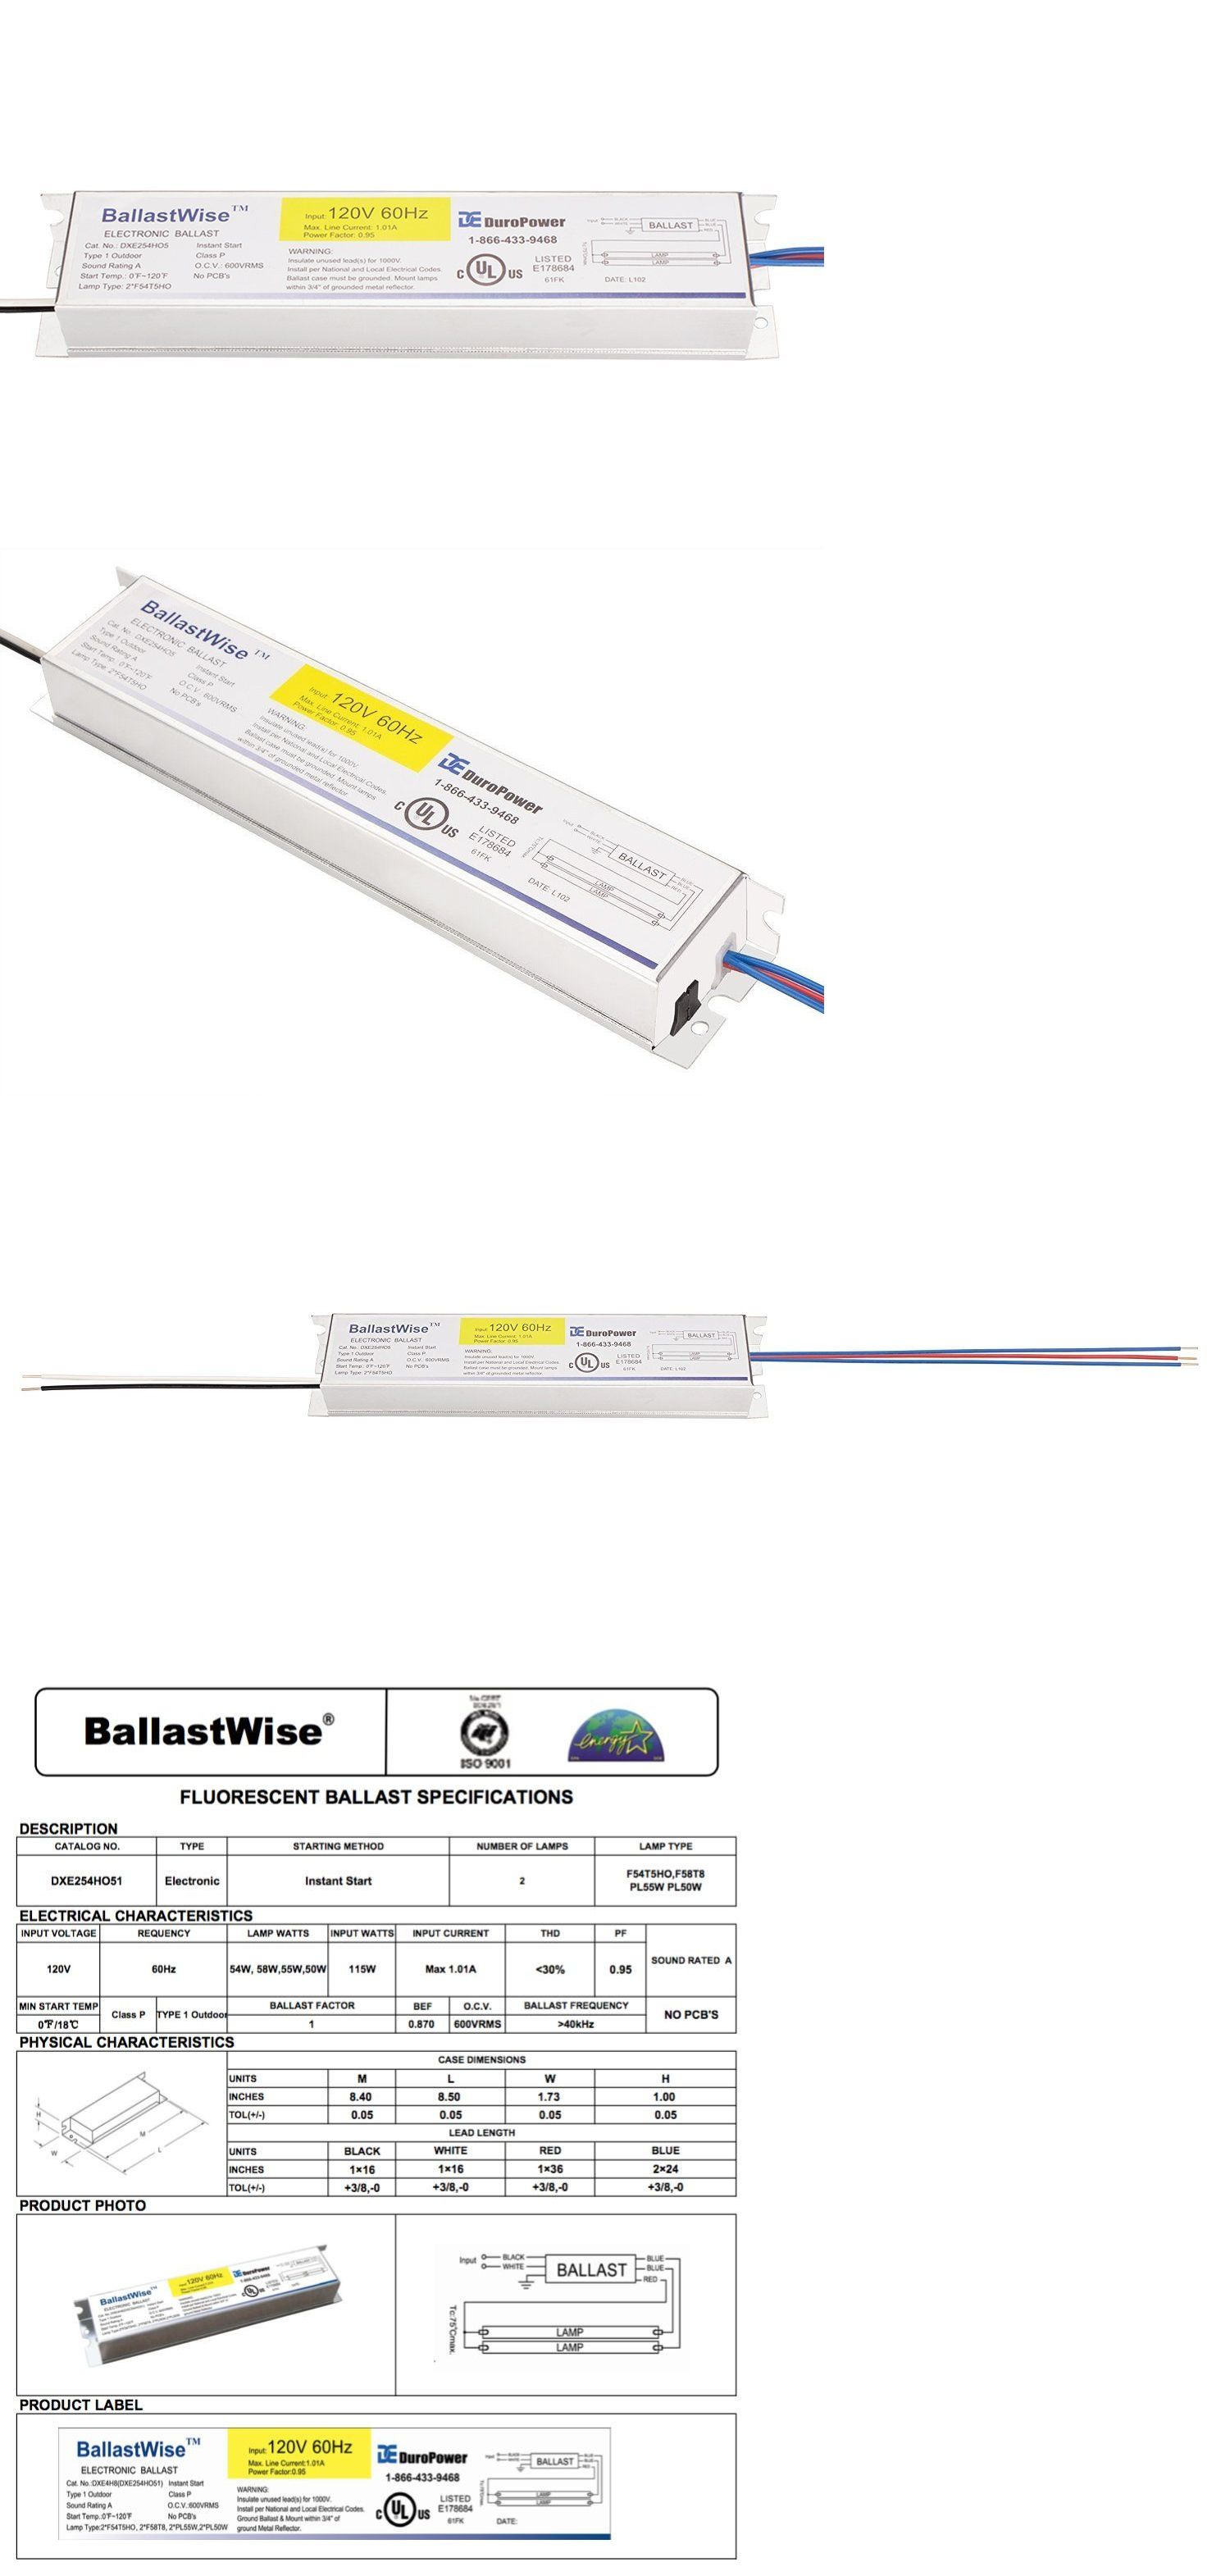 Ballastwise T5 Grow Light Ballast With Wires Dxe254ho51 For 2 F54t5ho Bulbs Ebay Grow Lights Ballast Bulb